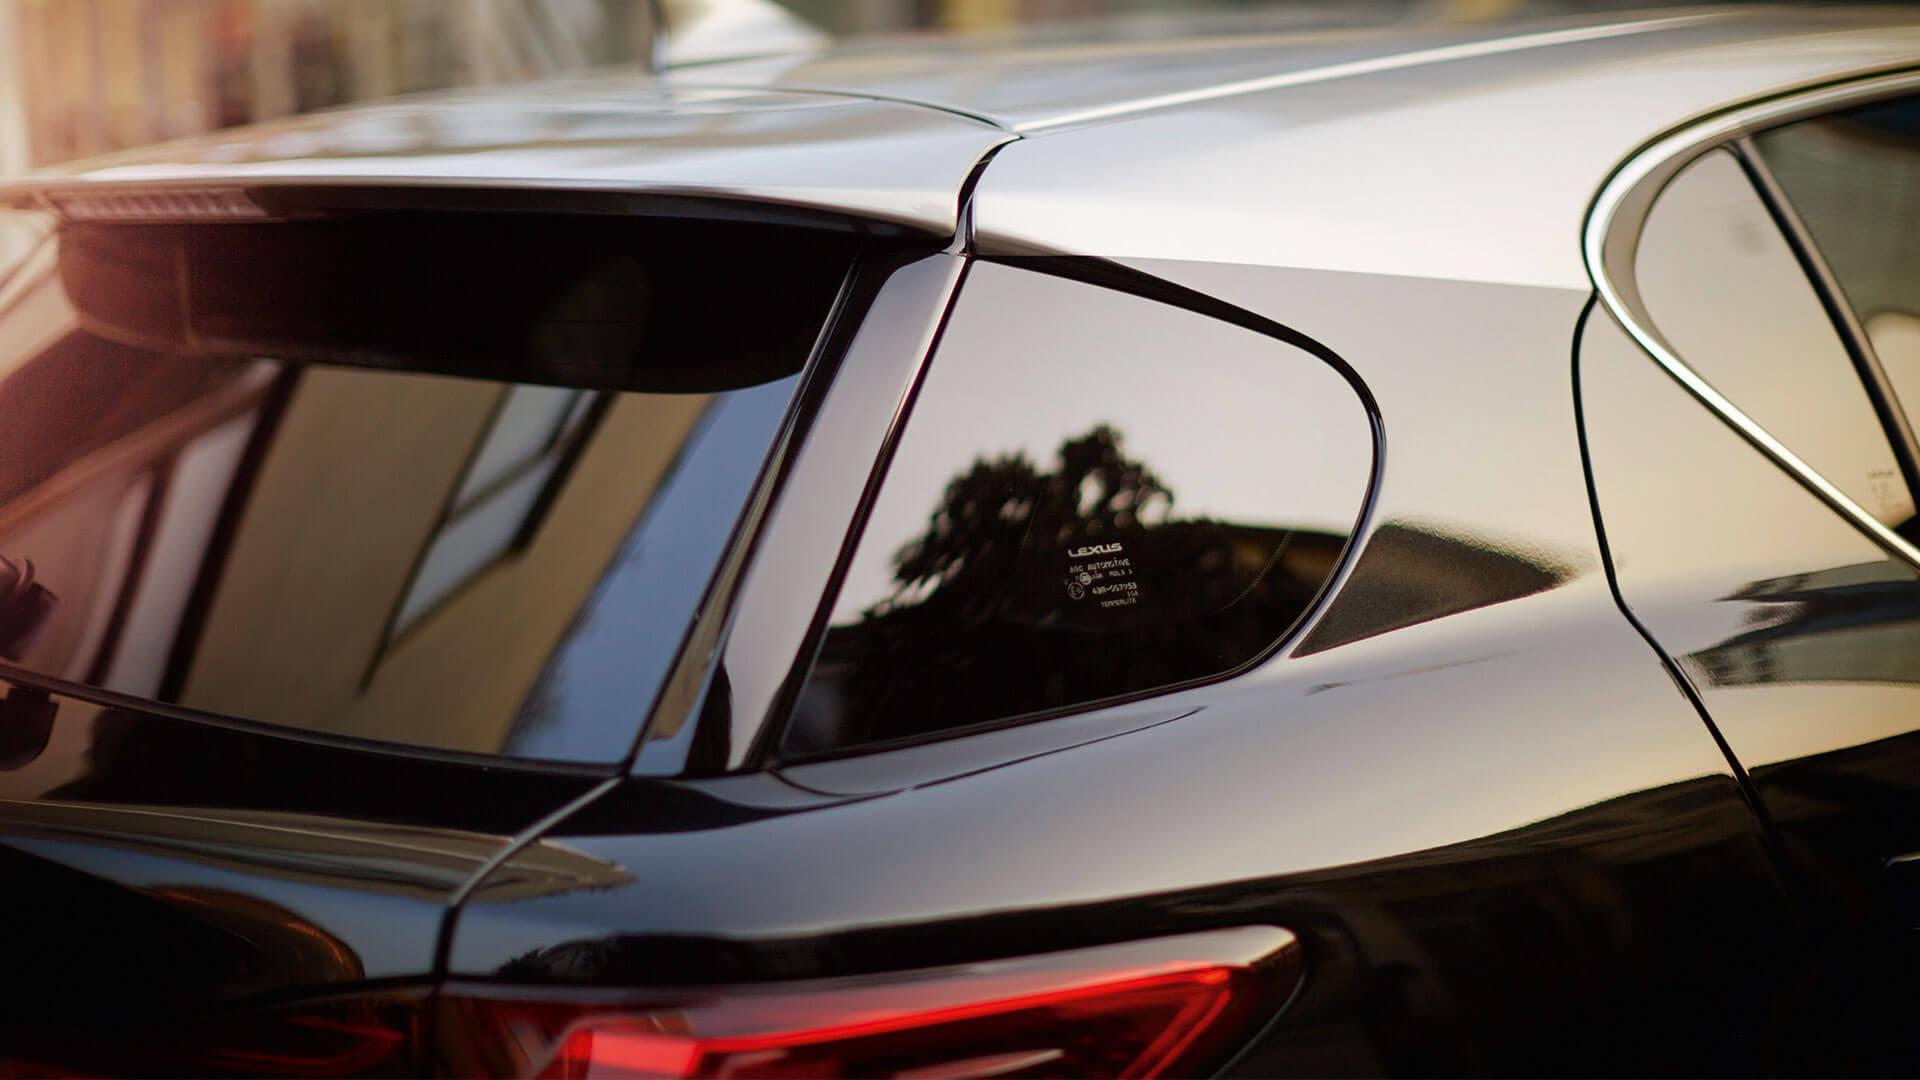 CT 200h Hybrid | 2020 Luxury Compact Hybrid | Lexus UK